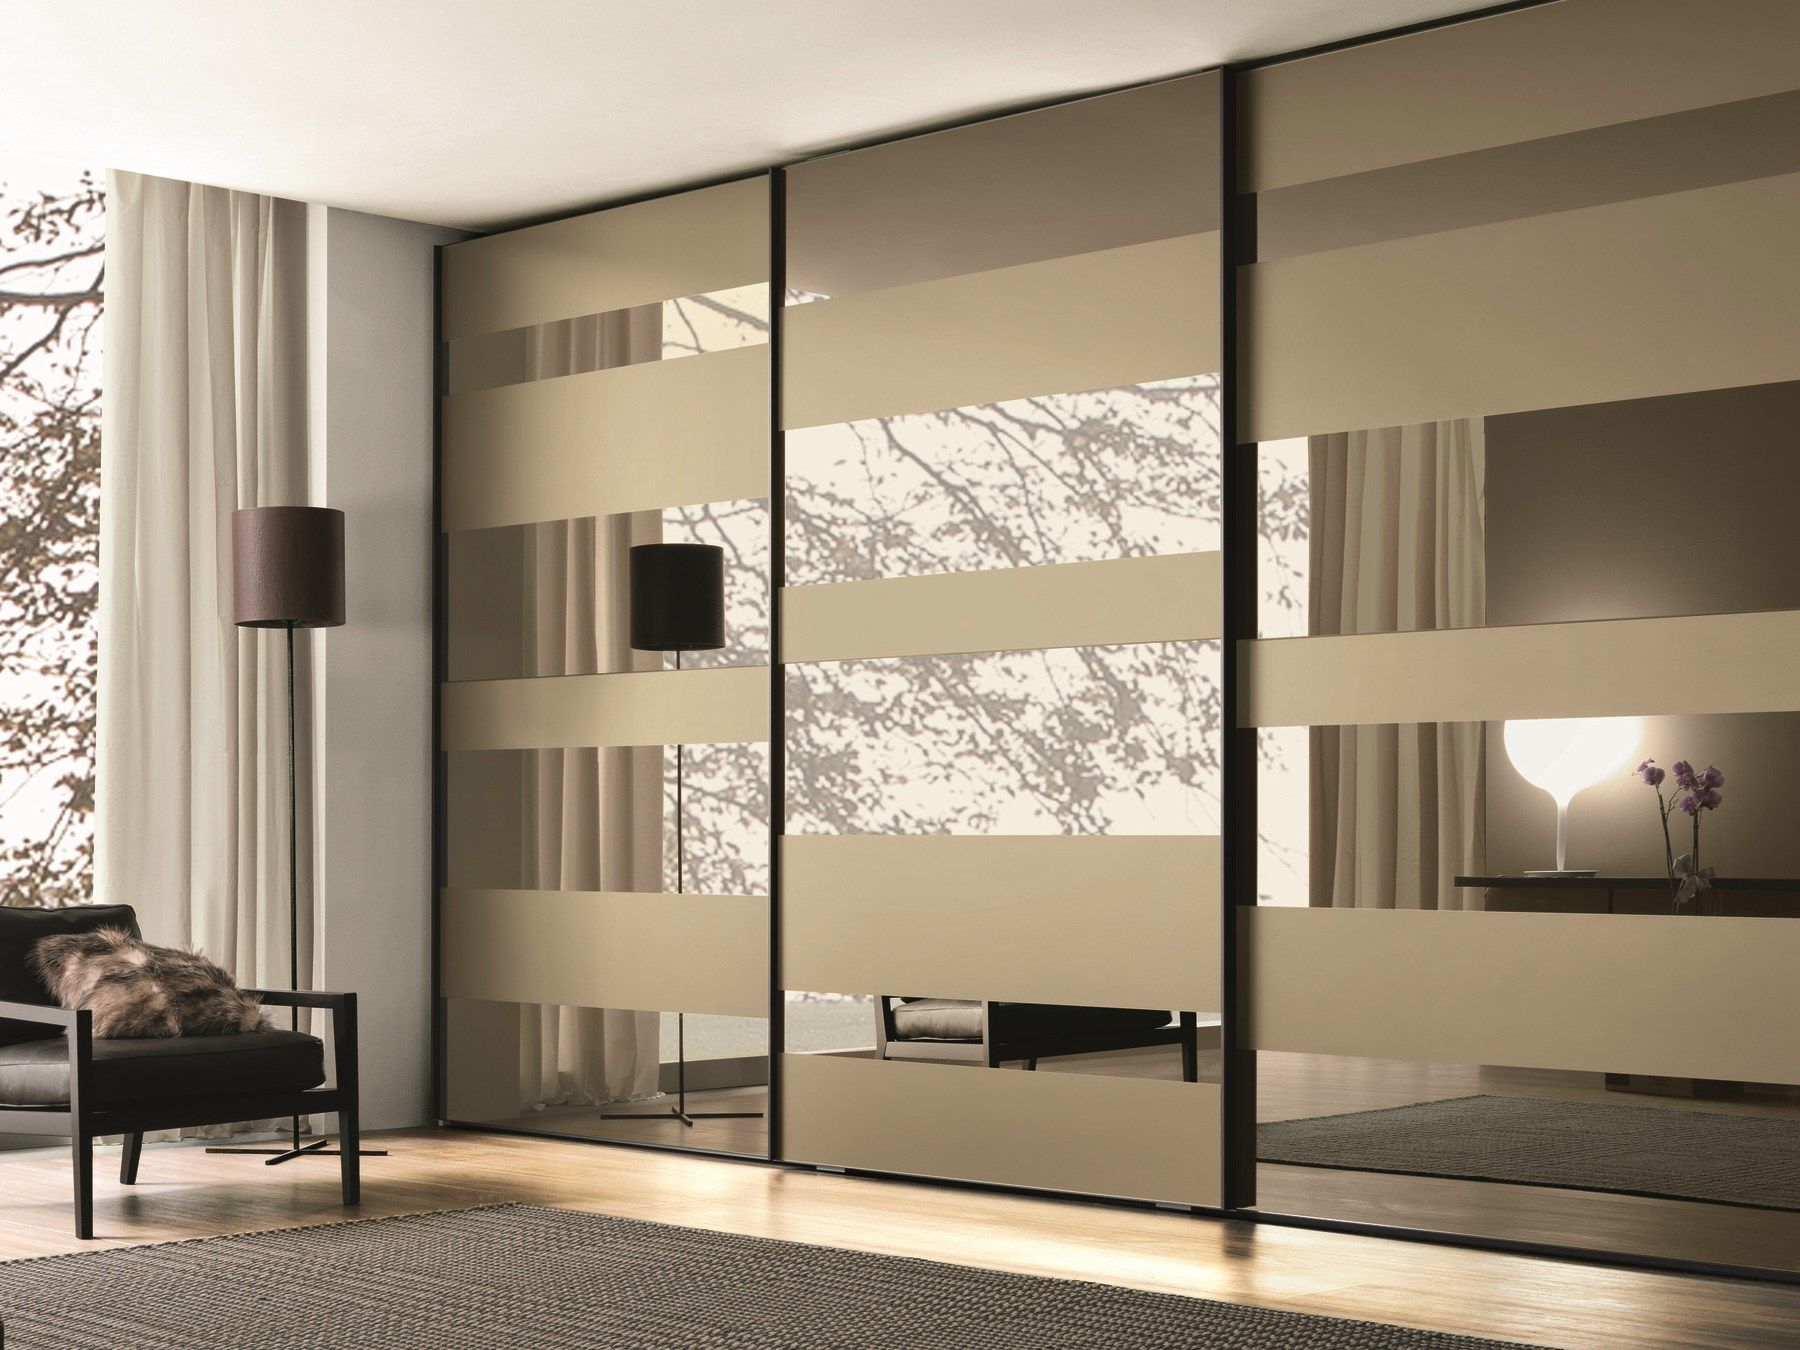 3 panel mirror sliding closet doors - Lacquered Wooden Wardrobe With Sliding Doors Segmenta New Misuraemme Collection By Misuraemme Design Mauro Lipparini